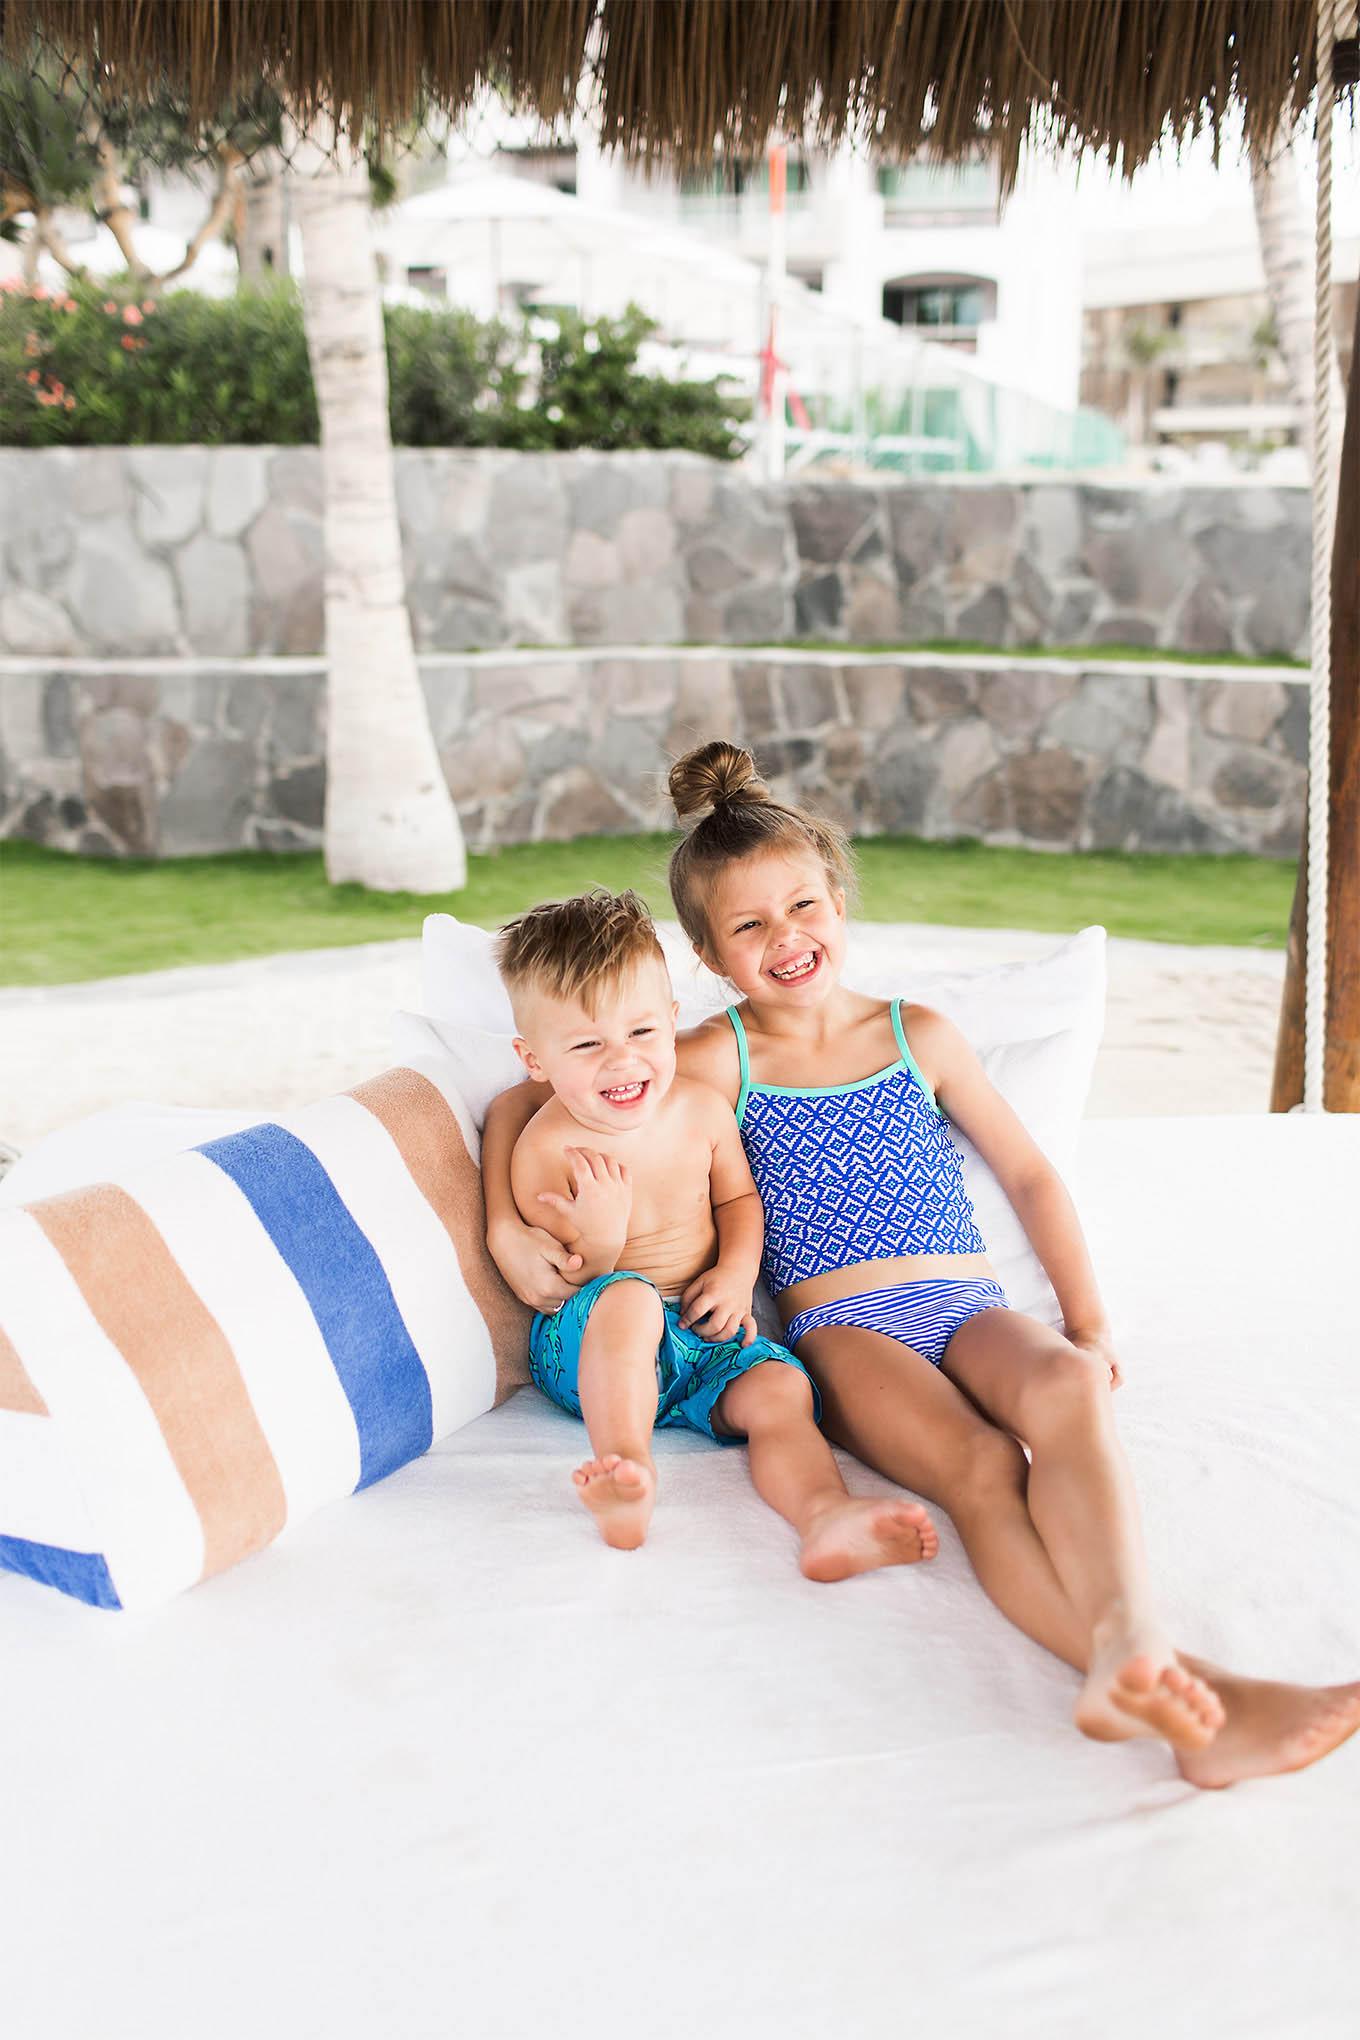 Kids swimwear under $30